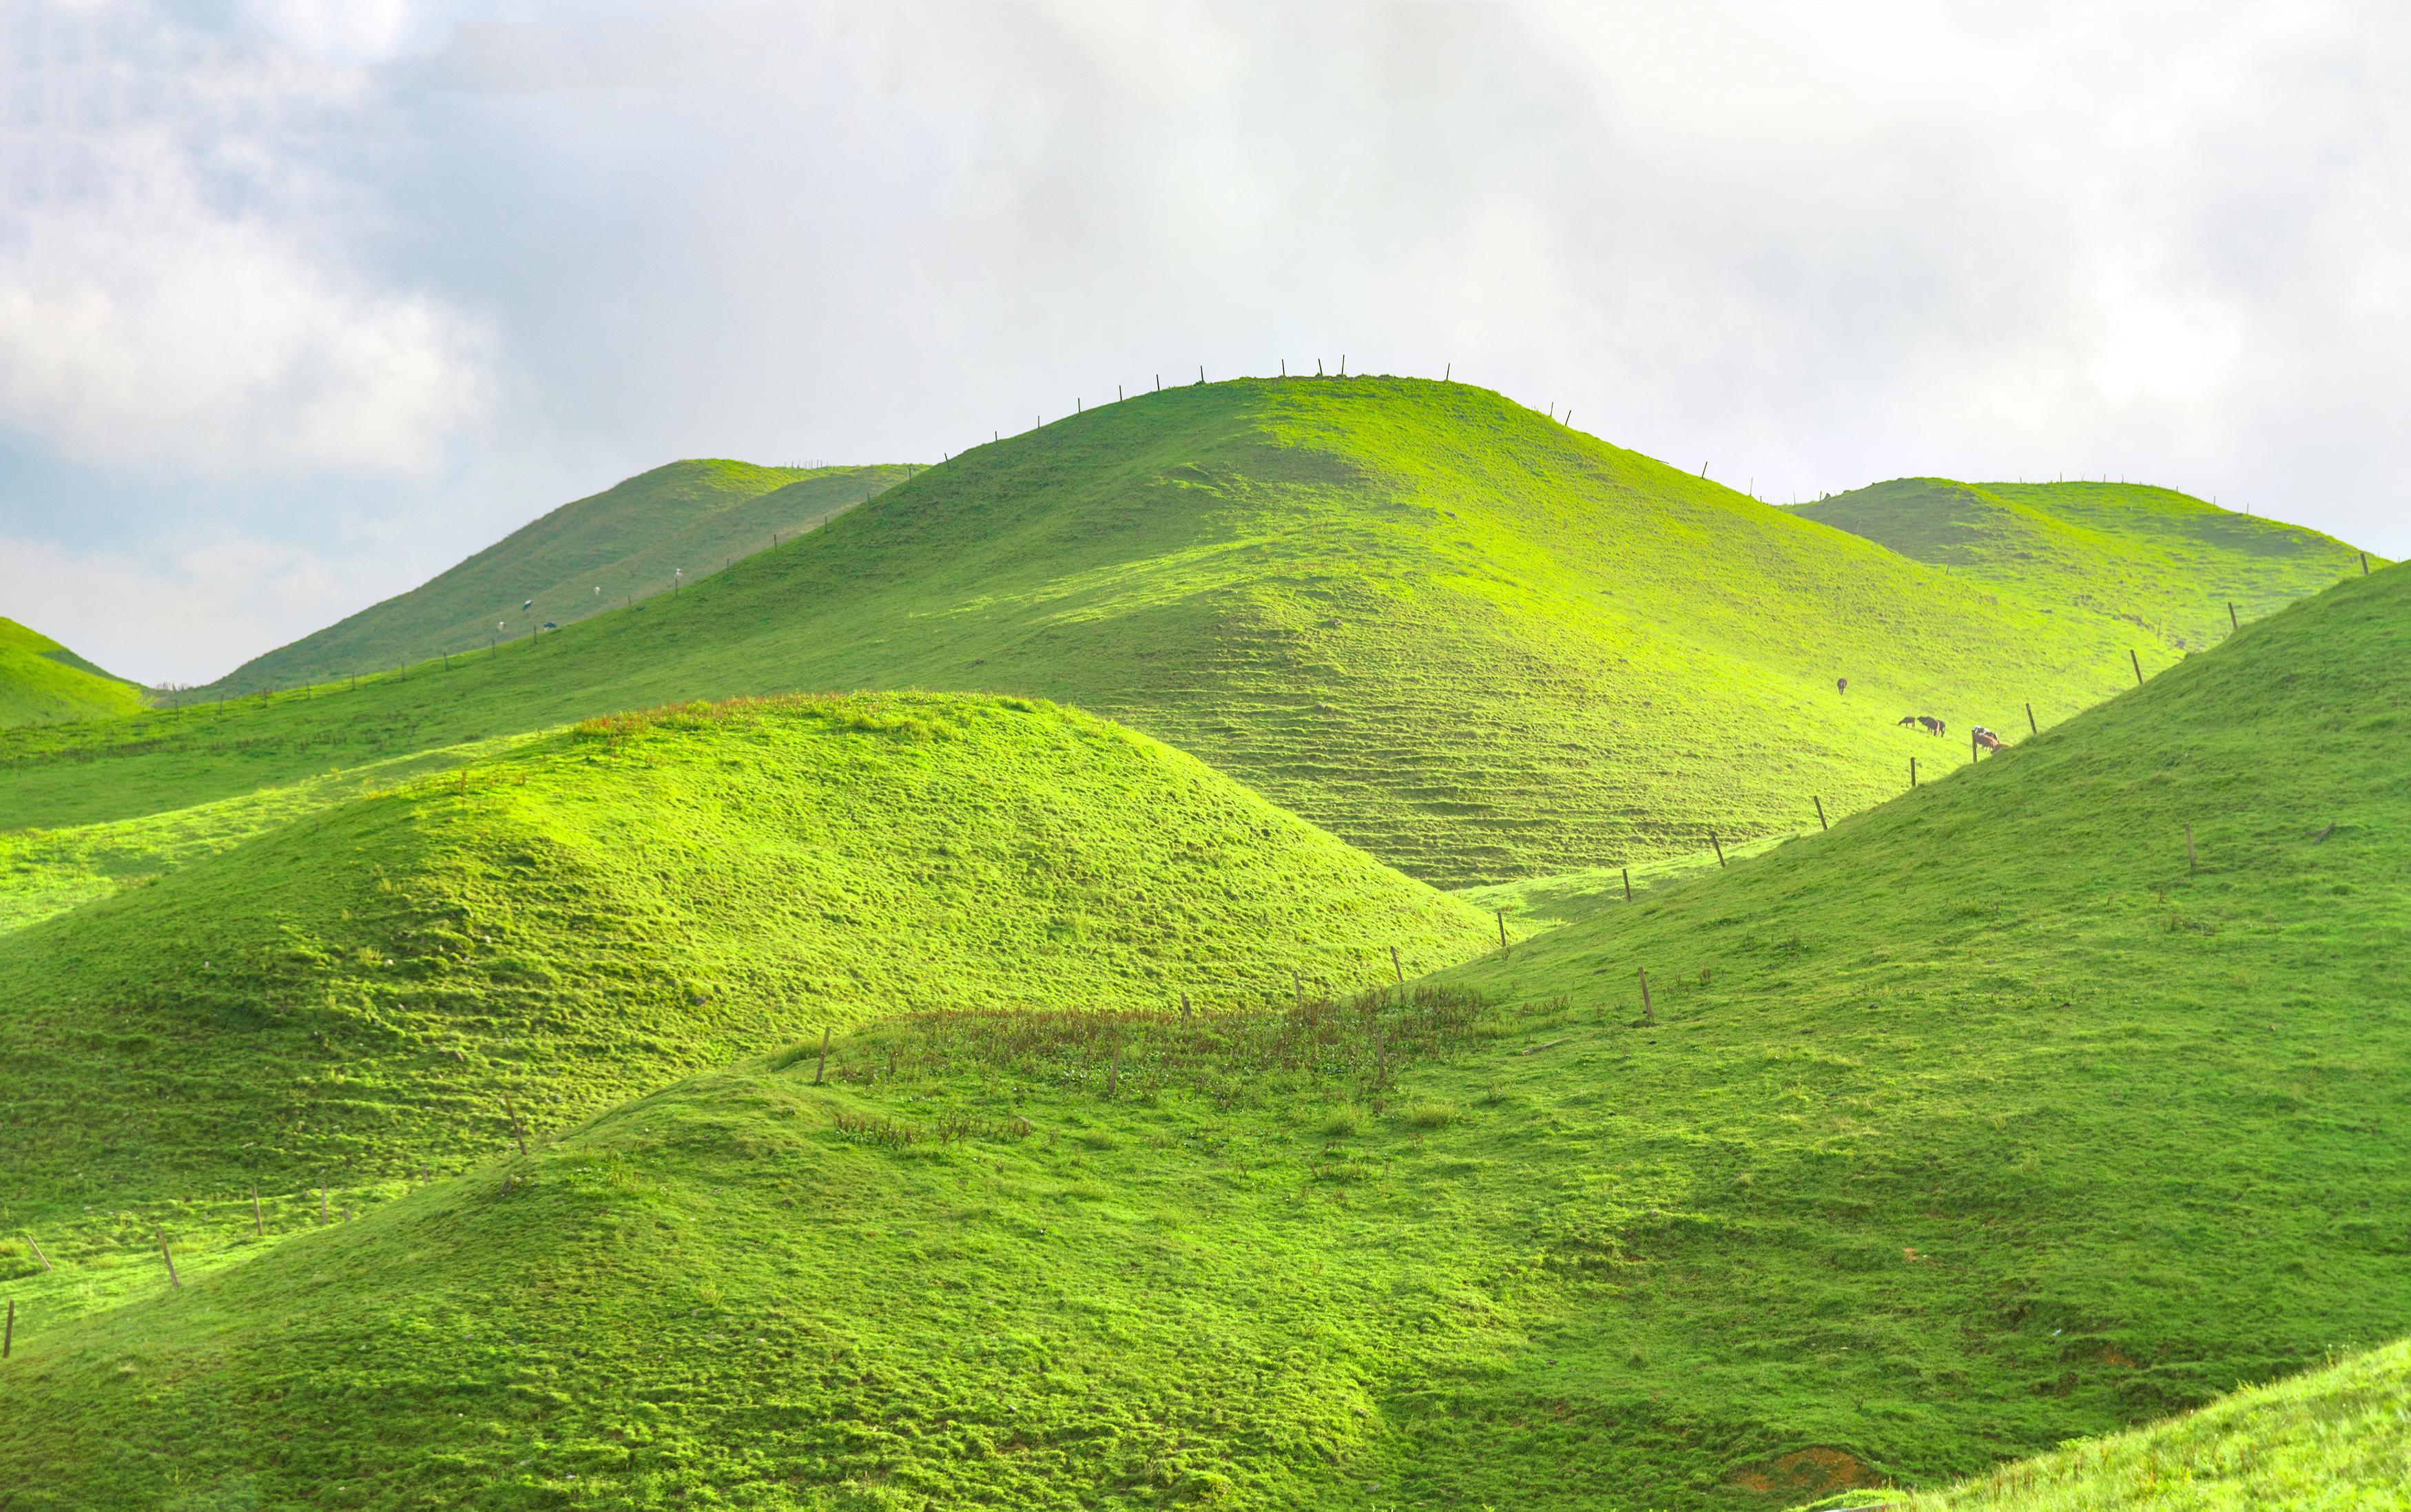 Yunvxi Scenic Area